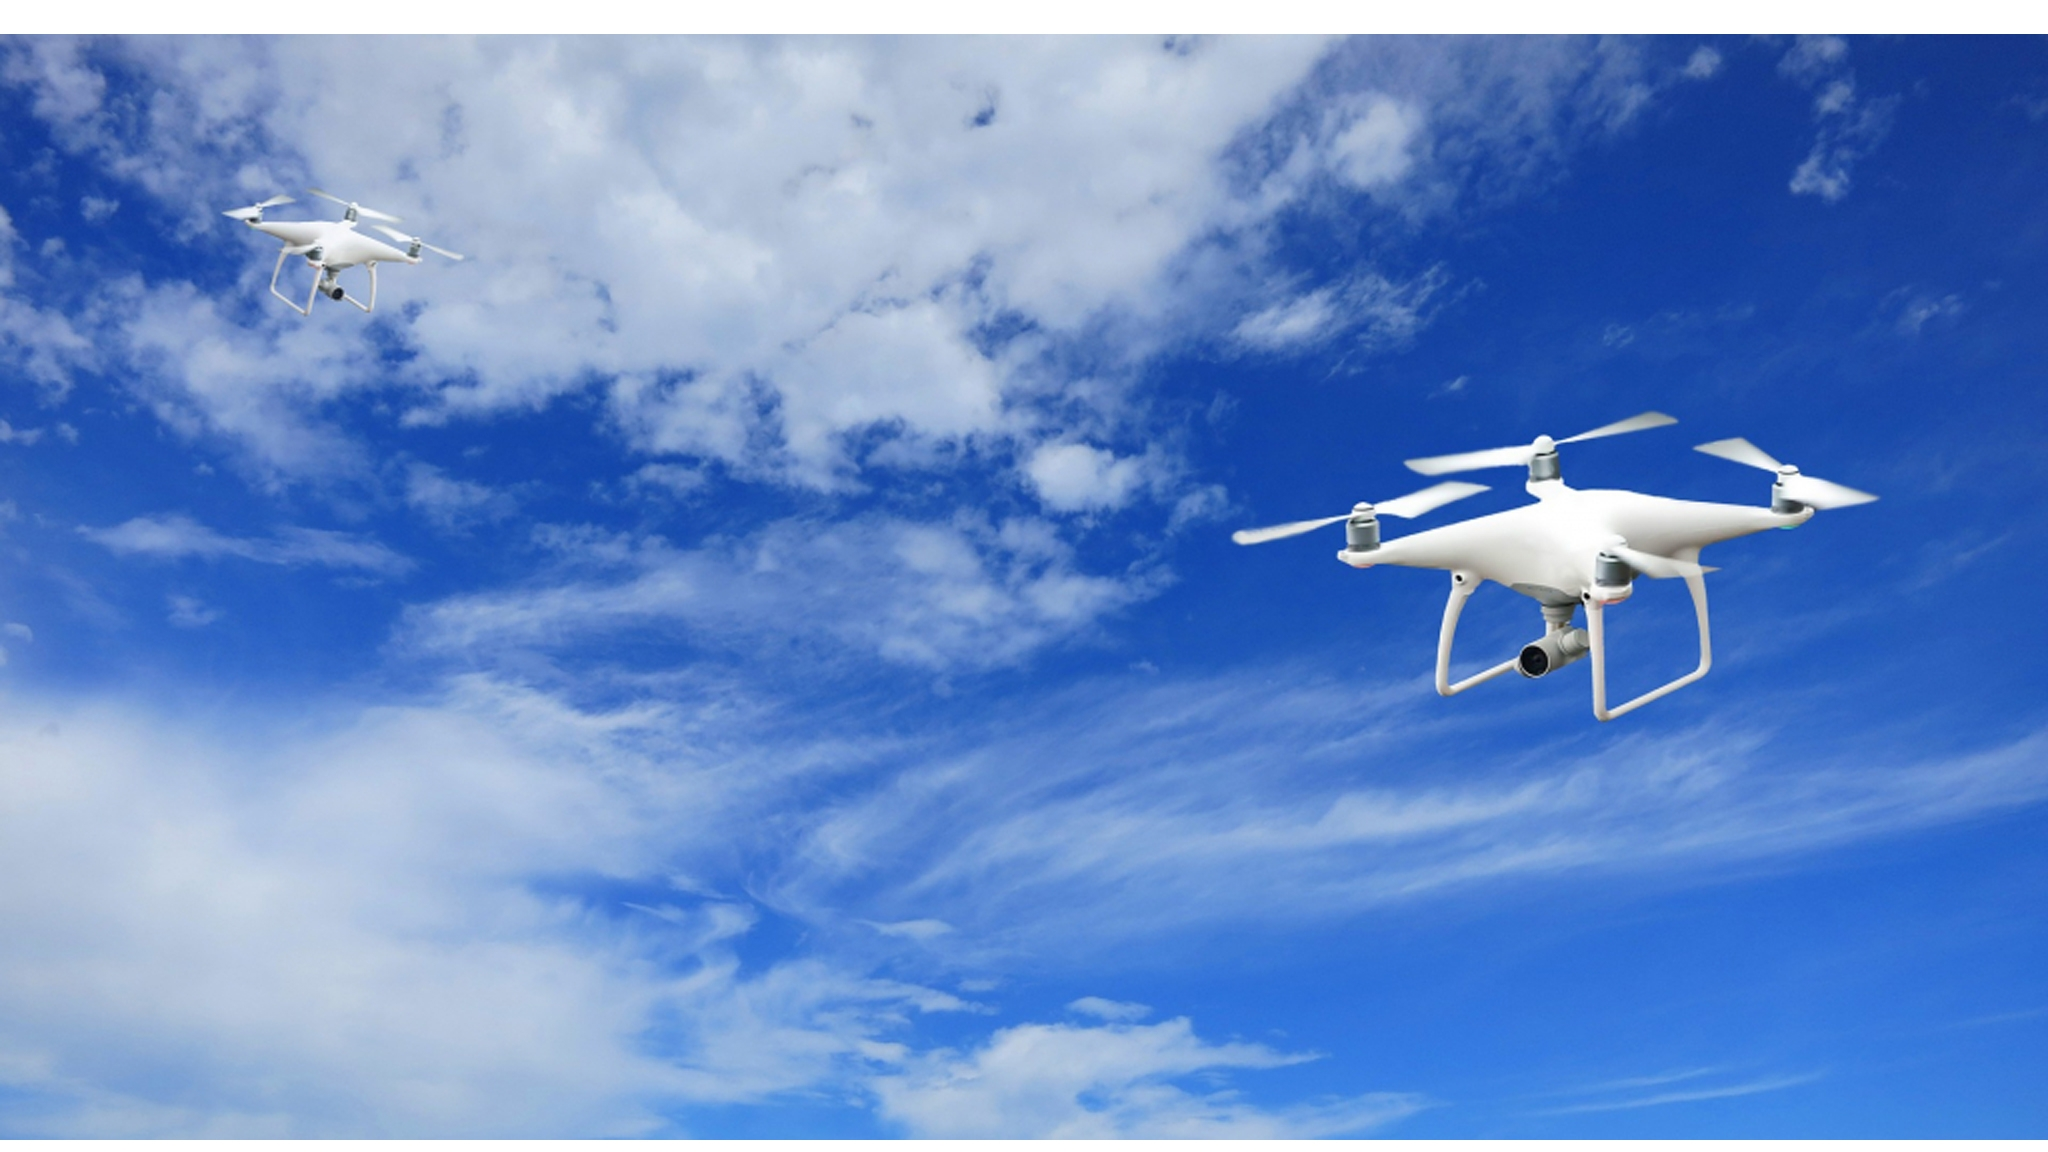 quadrocopter mit kamera (@quadrocopterbausatz) Cover Image